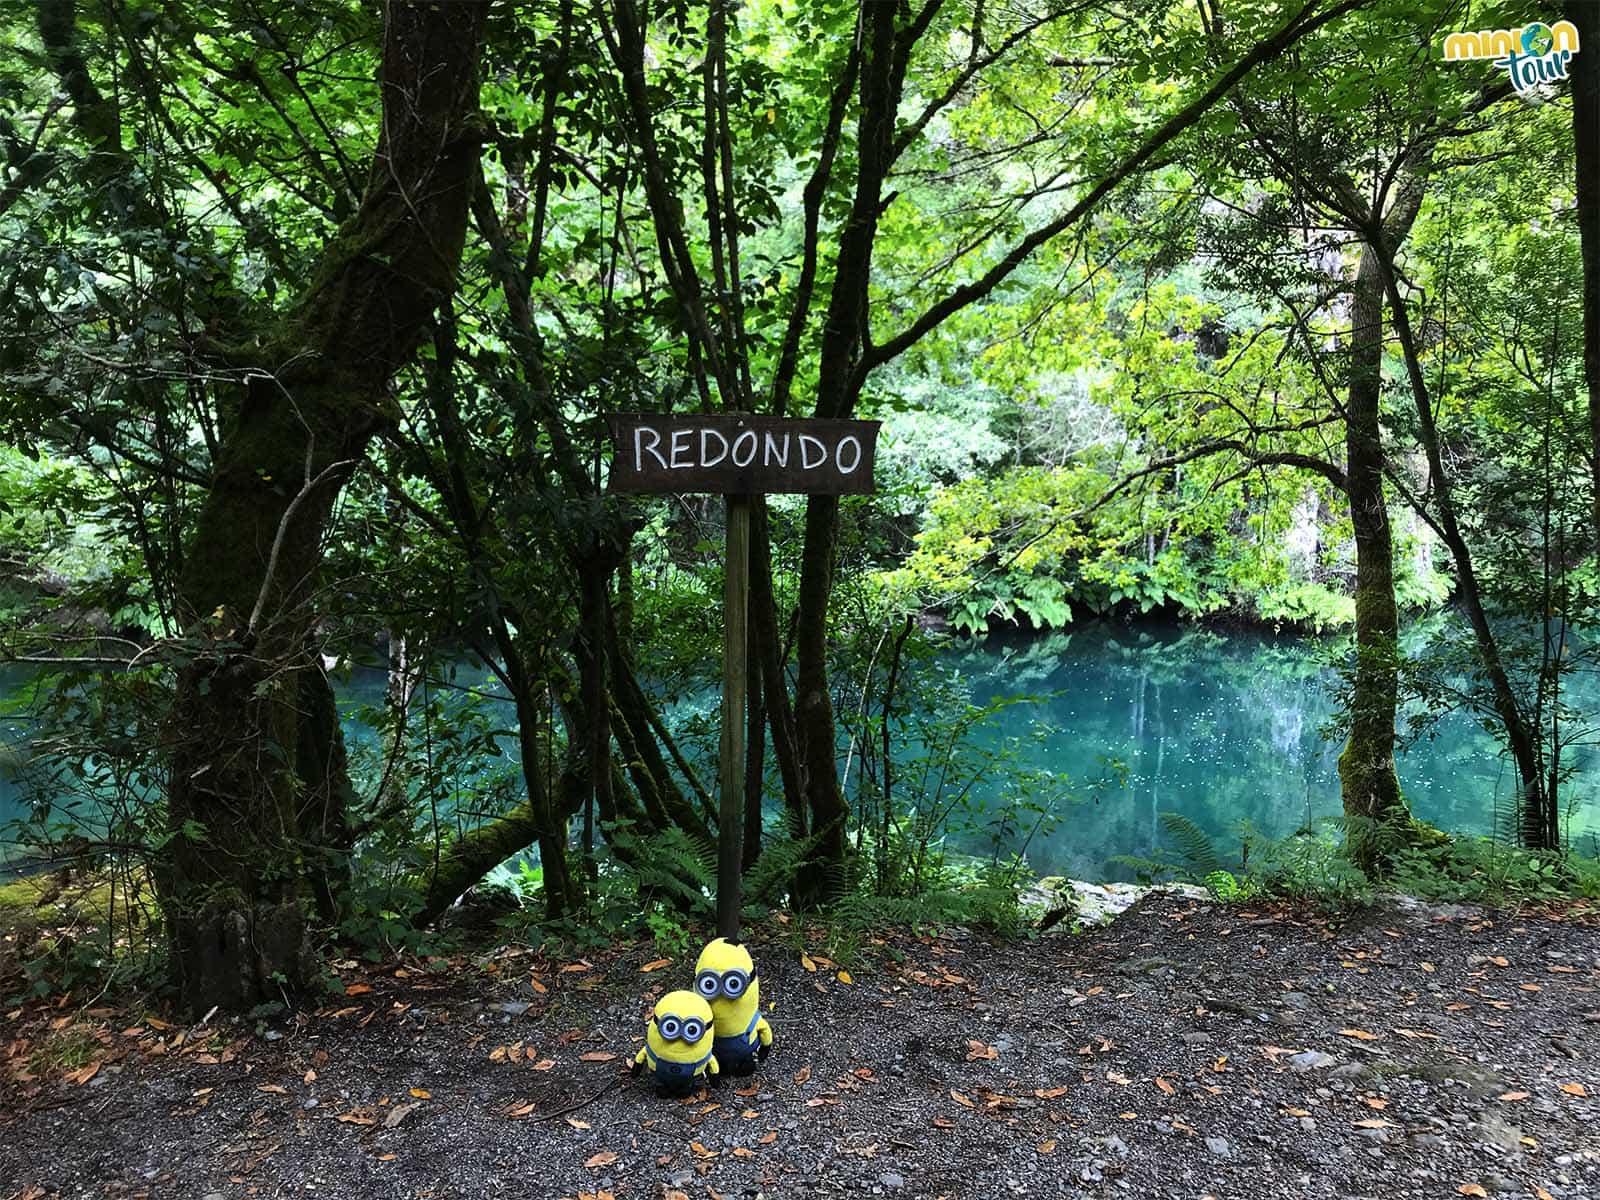 Lugar llamado Redondo en las Fragas do Eume